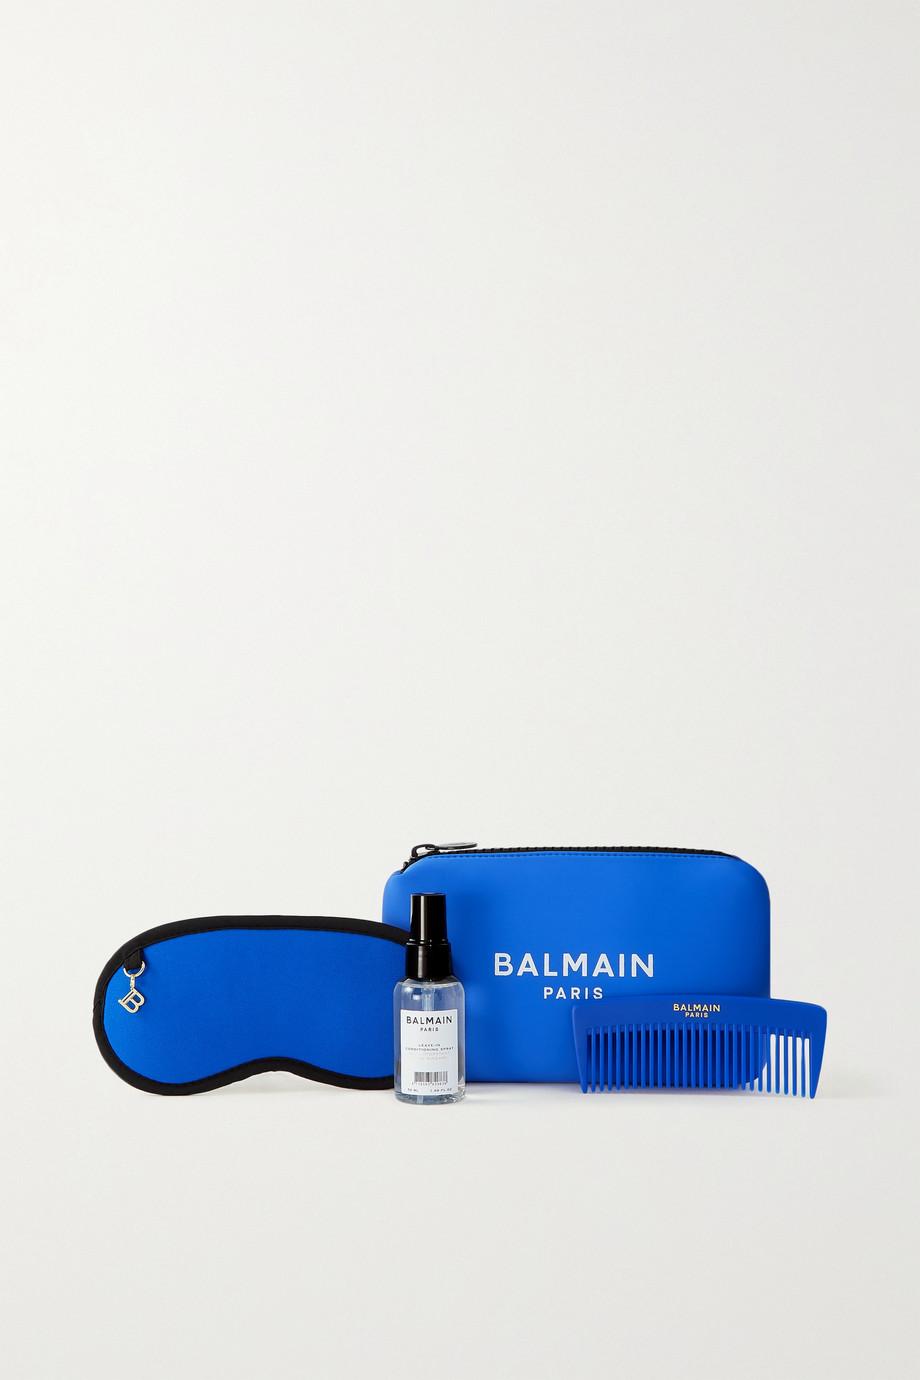 Balmain Paris Hair Couture Cosmetic Bag Set - Blue